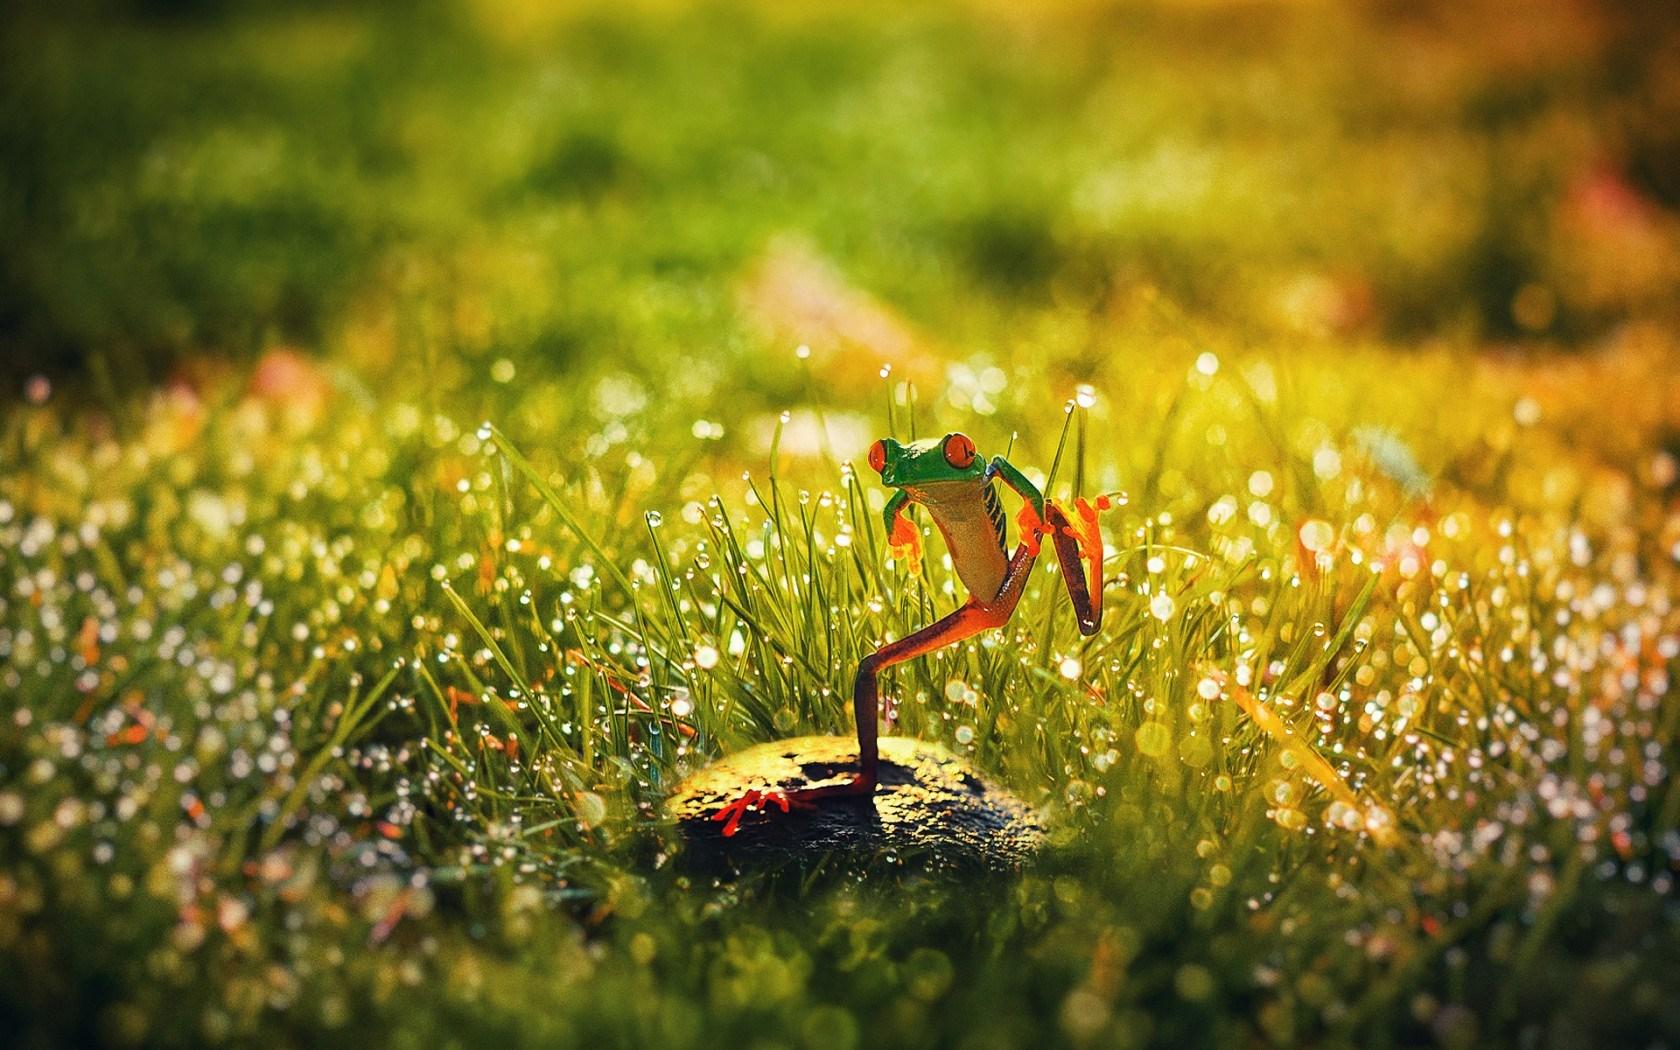 Crazy Frog Rock Grass Morning Dew